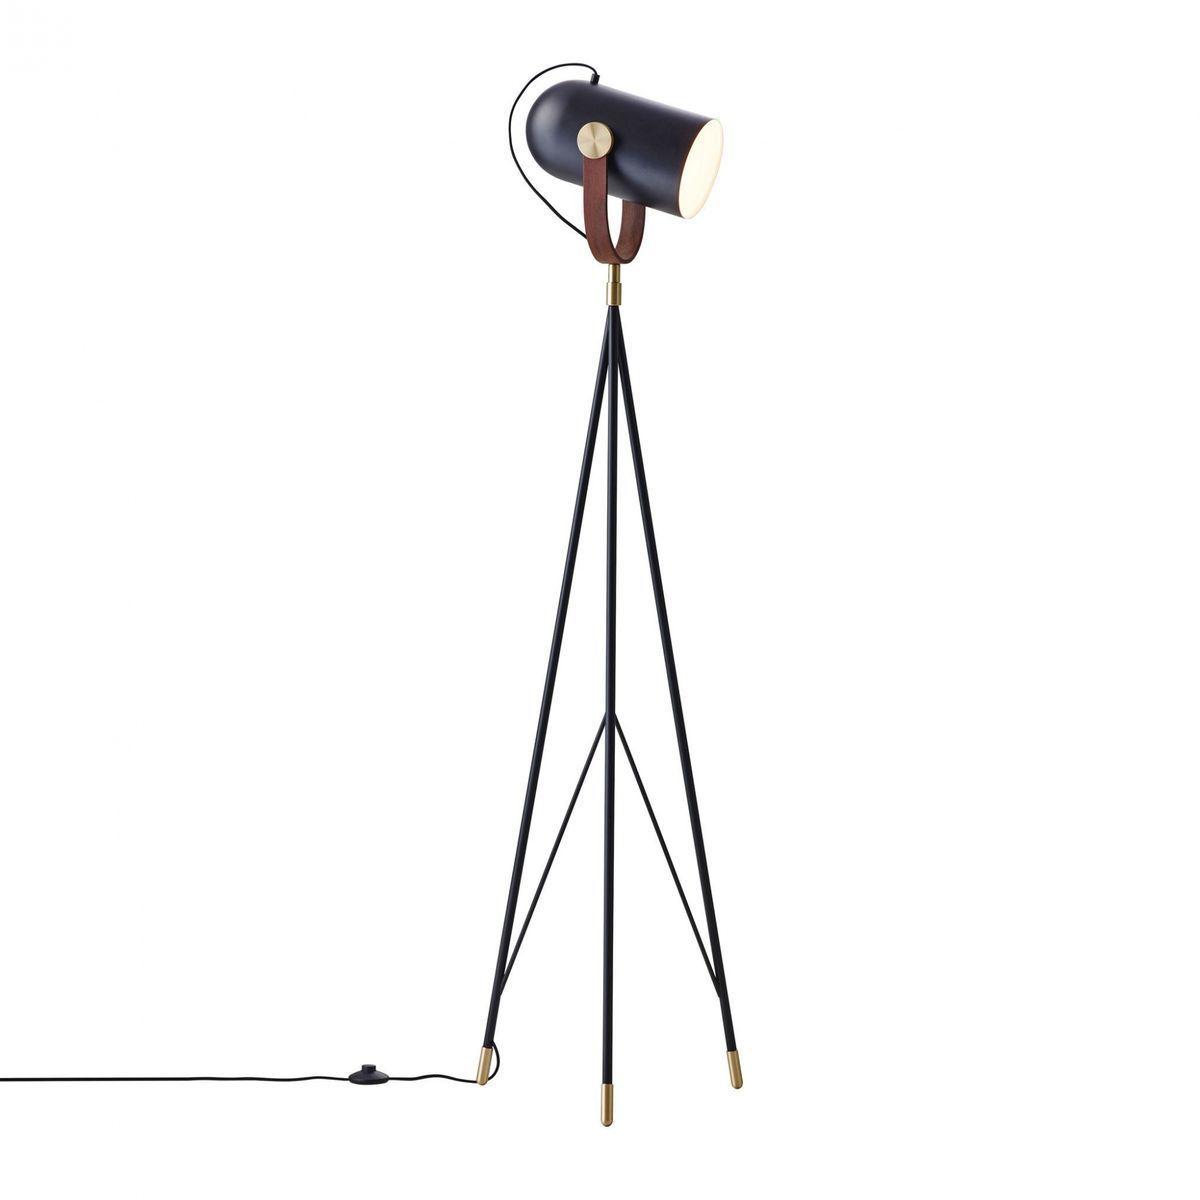 le klint carronade floor lamp high  le klint  ambientedirectcom - le klint  le klint carronade floor lamp high  blackbrasswalnut